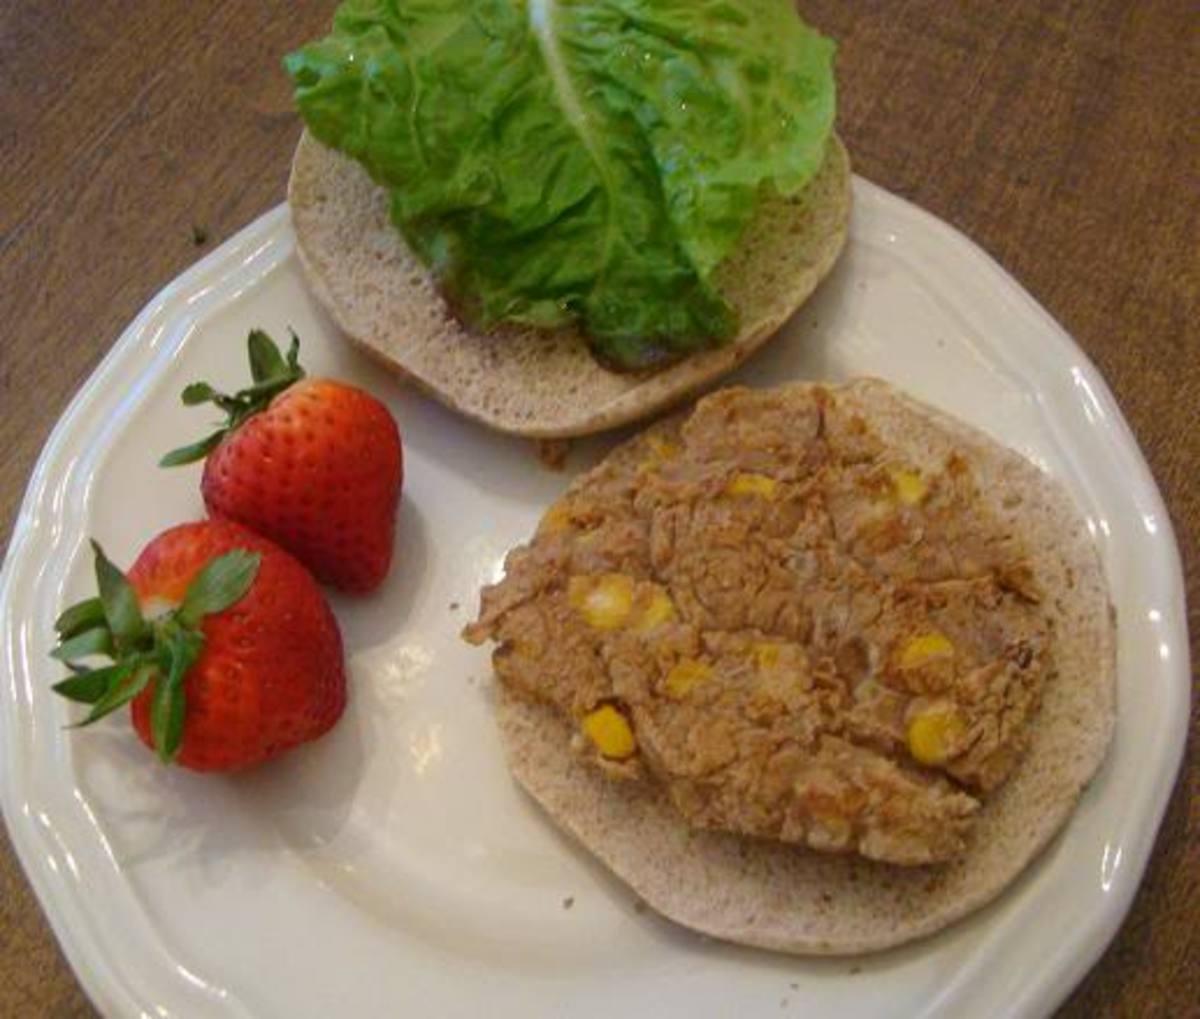 Bean and Corn Veggie Burger served on a thin bun.